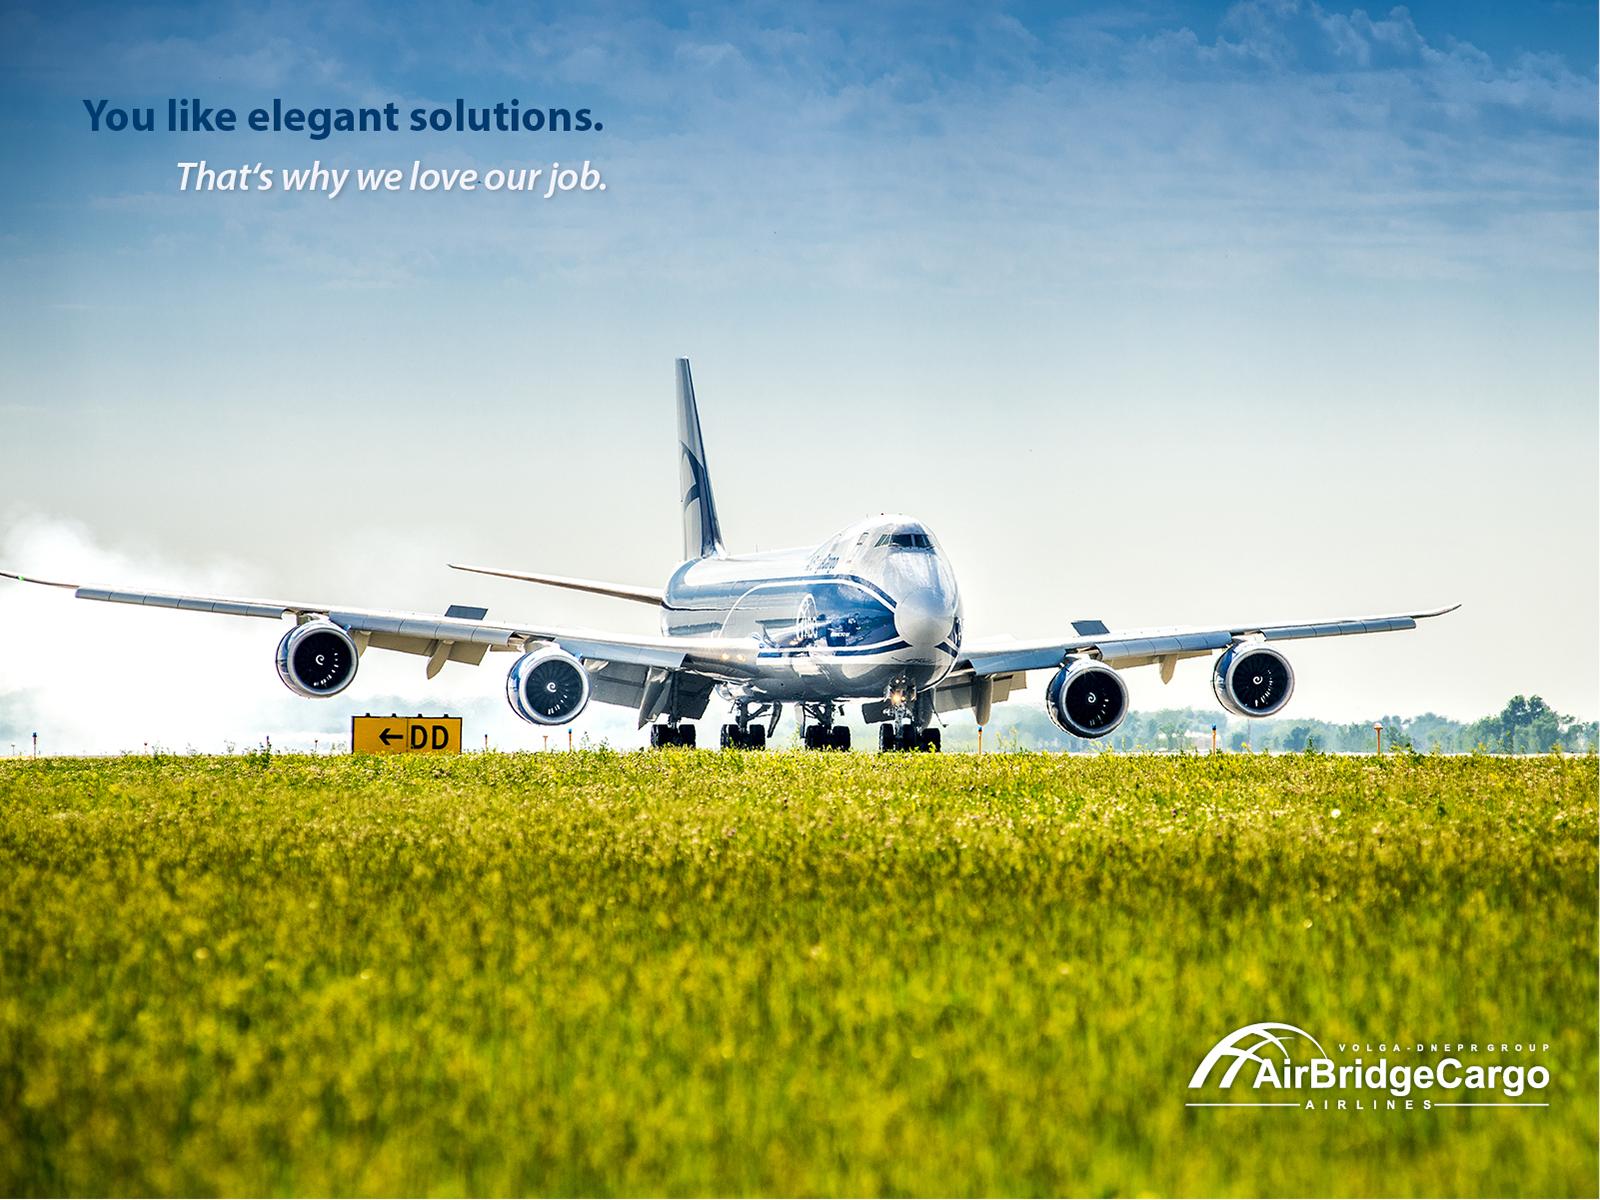 airbridgecargo airlines screensavers